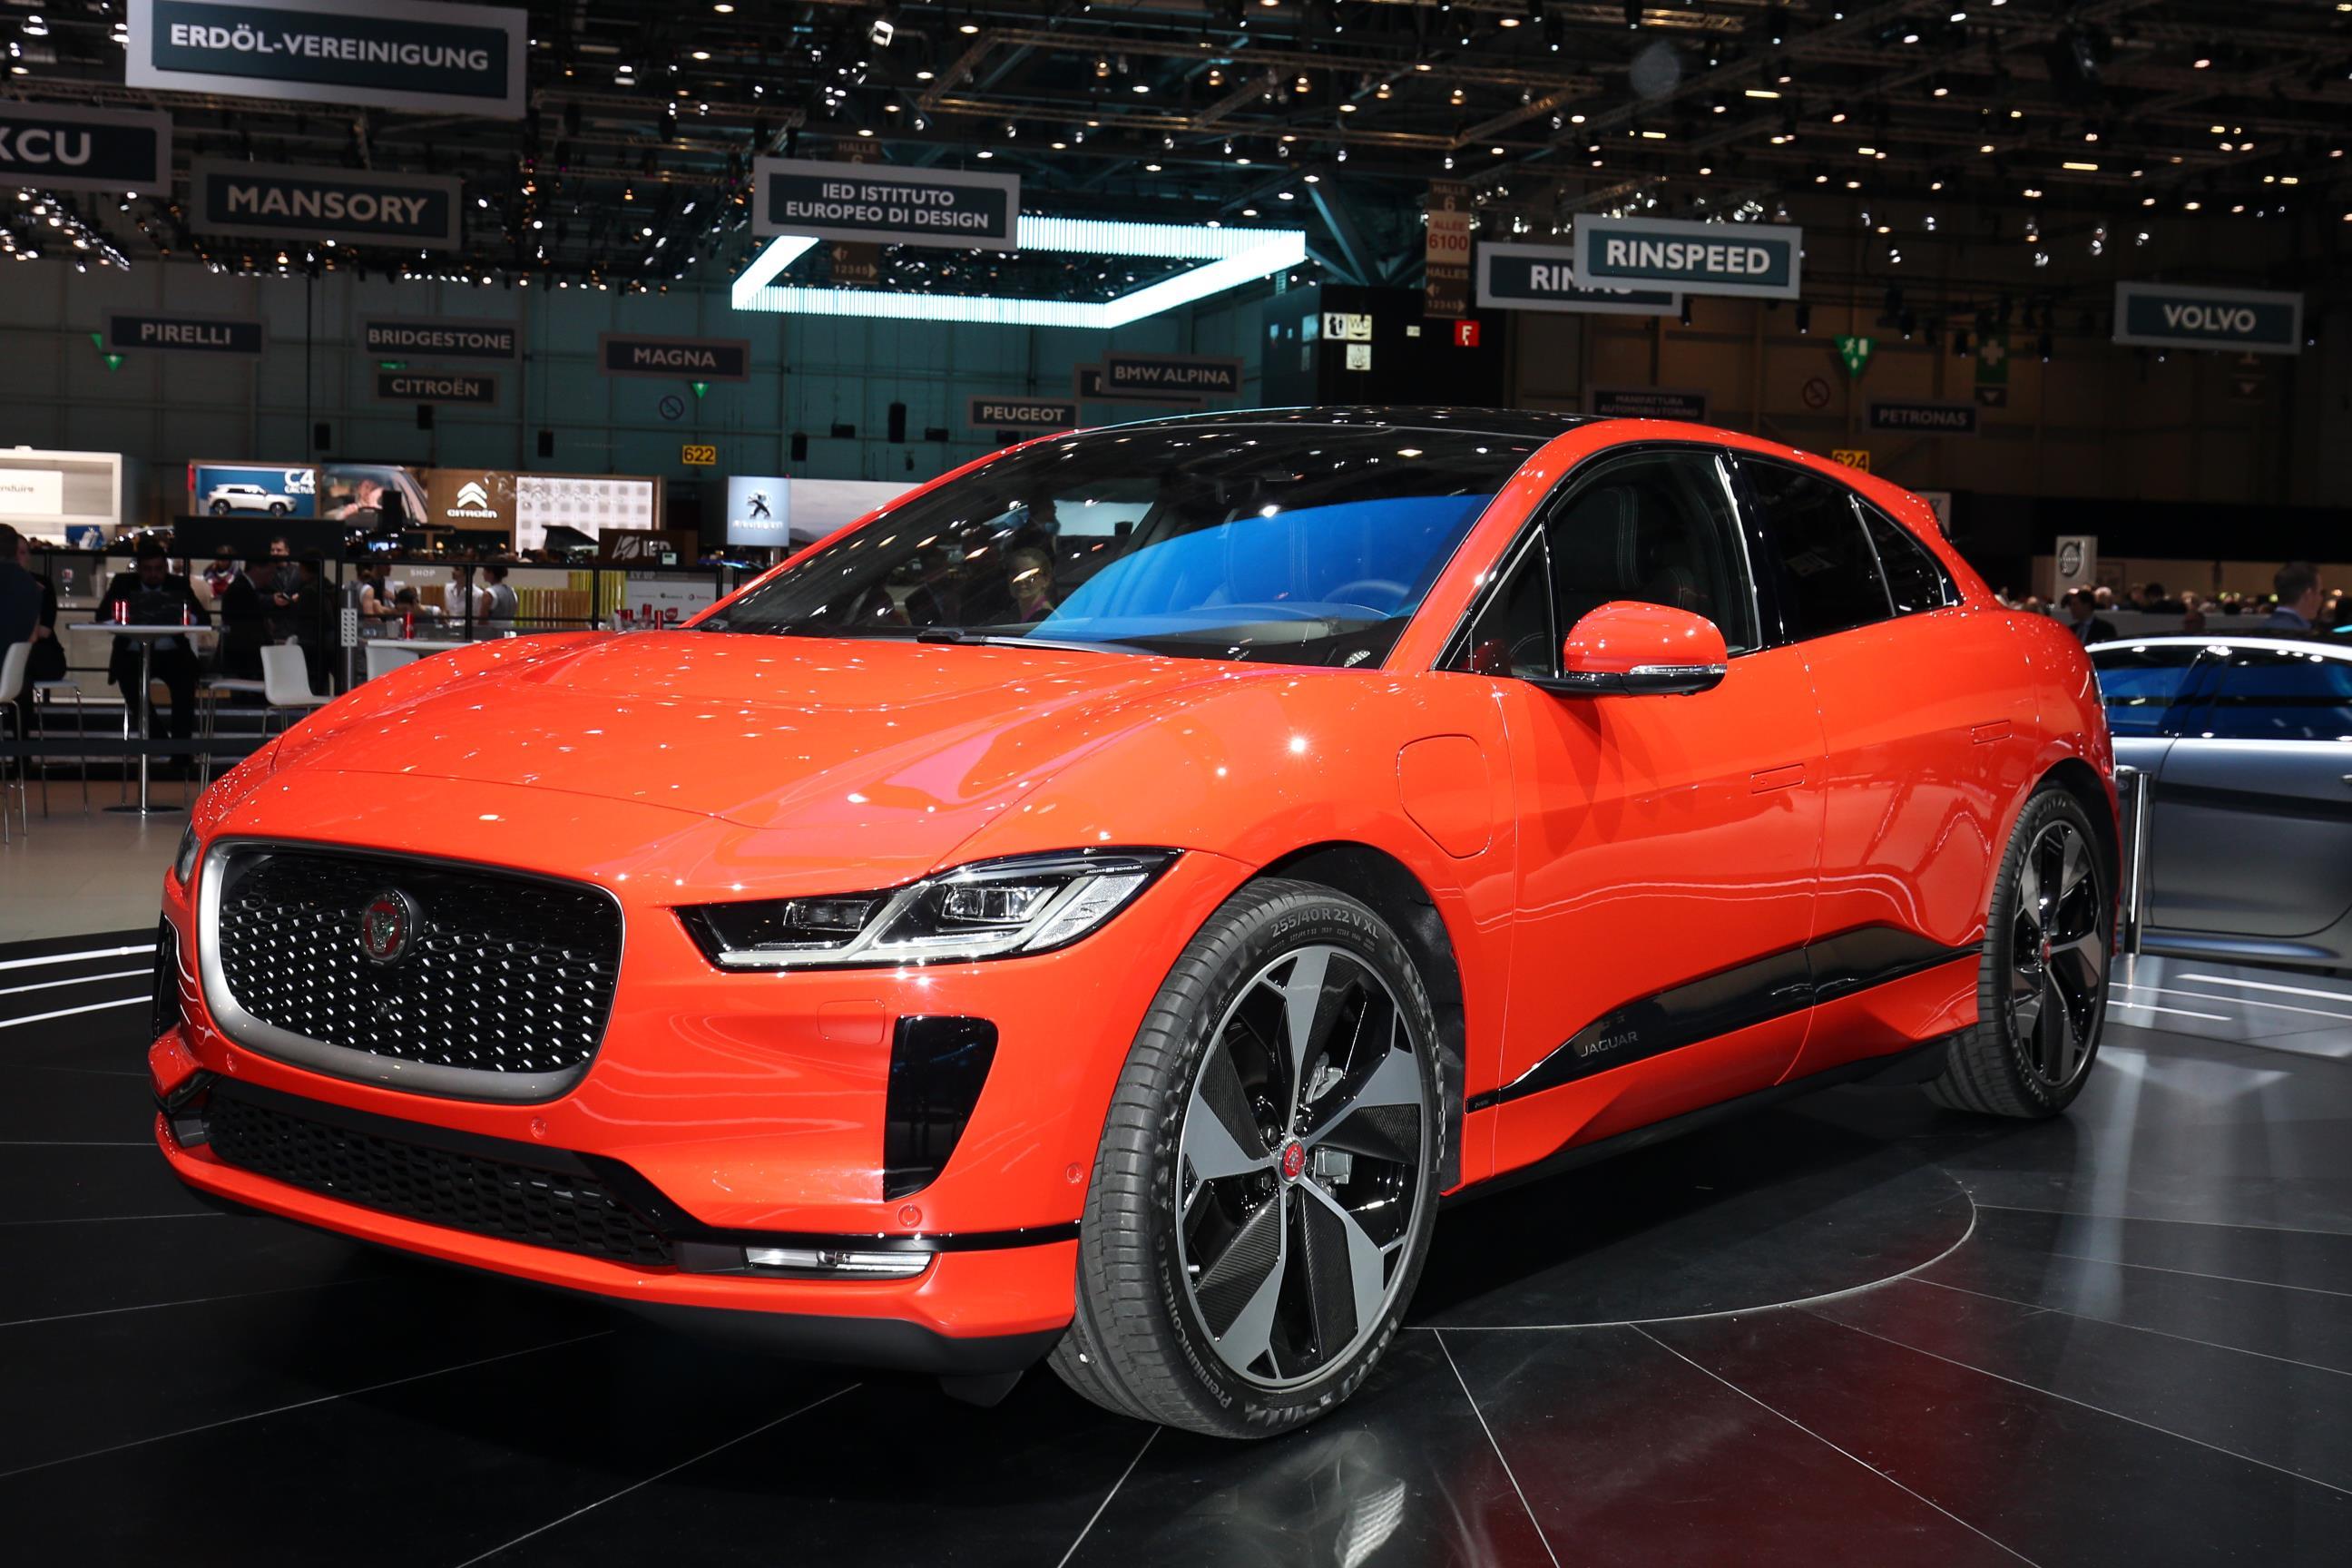 Beautiful new Jaguar I-PACE debuts at the Geneva Motor Show